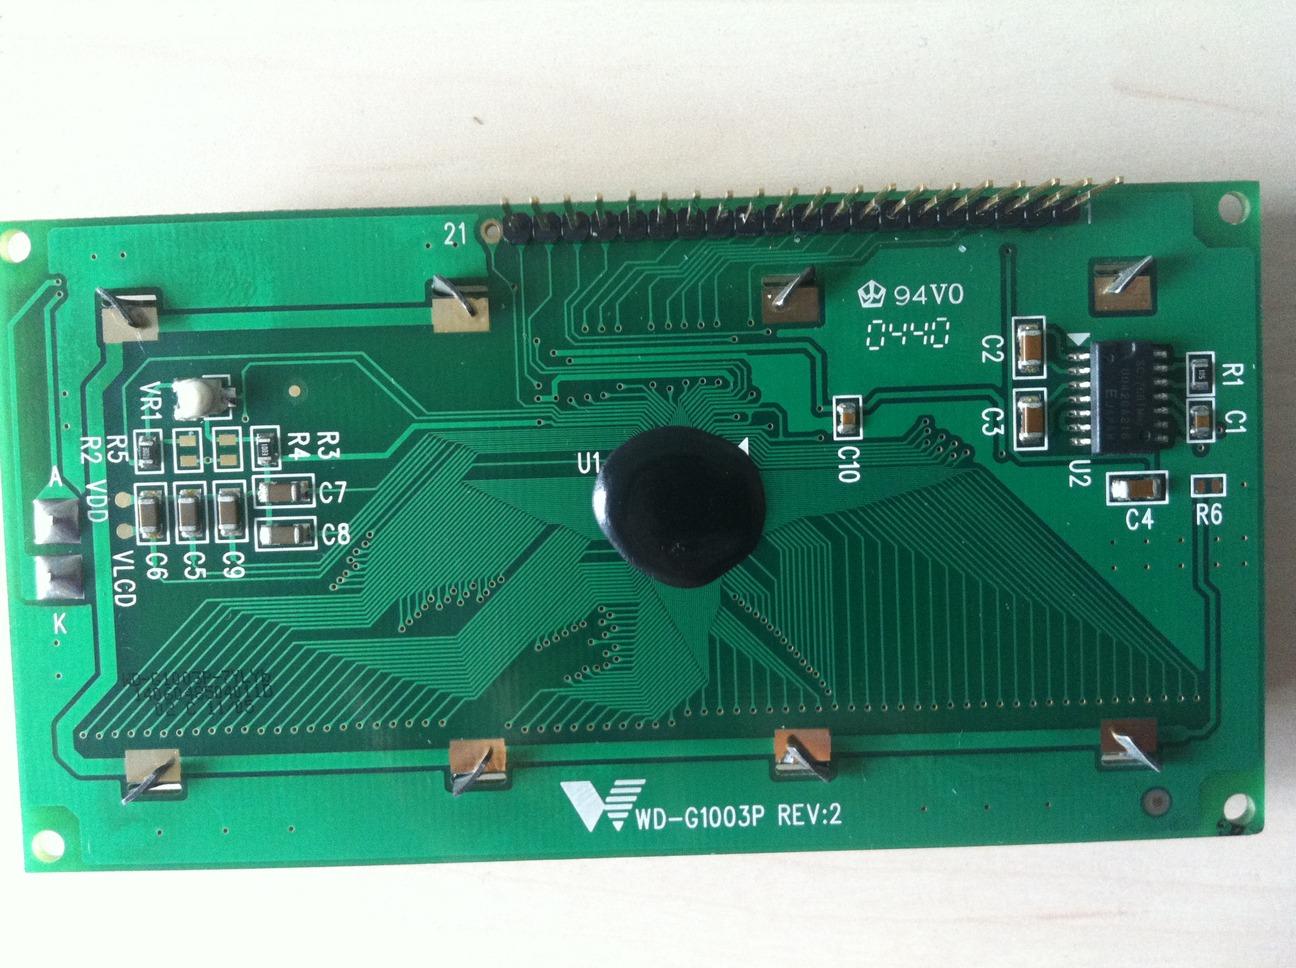 Suche Daten zum LCD-Display Wintek WD-G1003P ... - photo#49